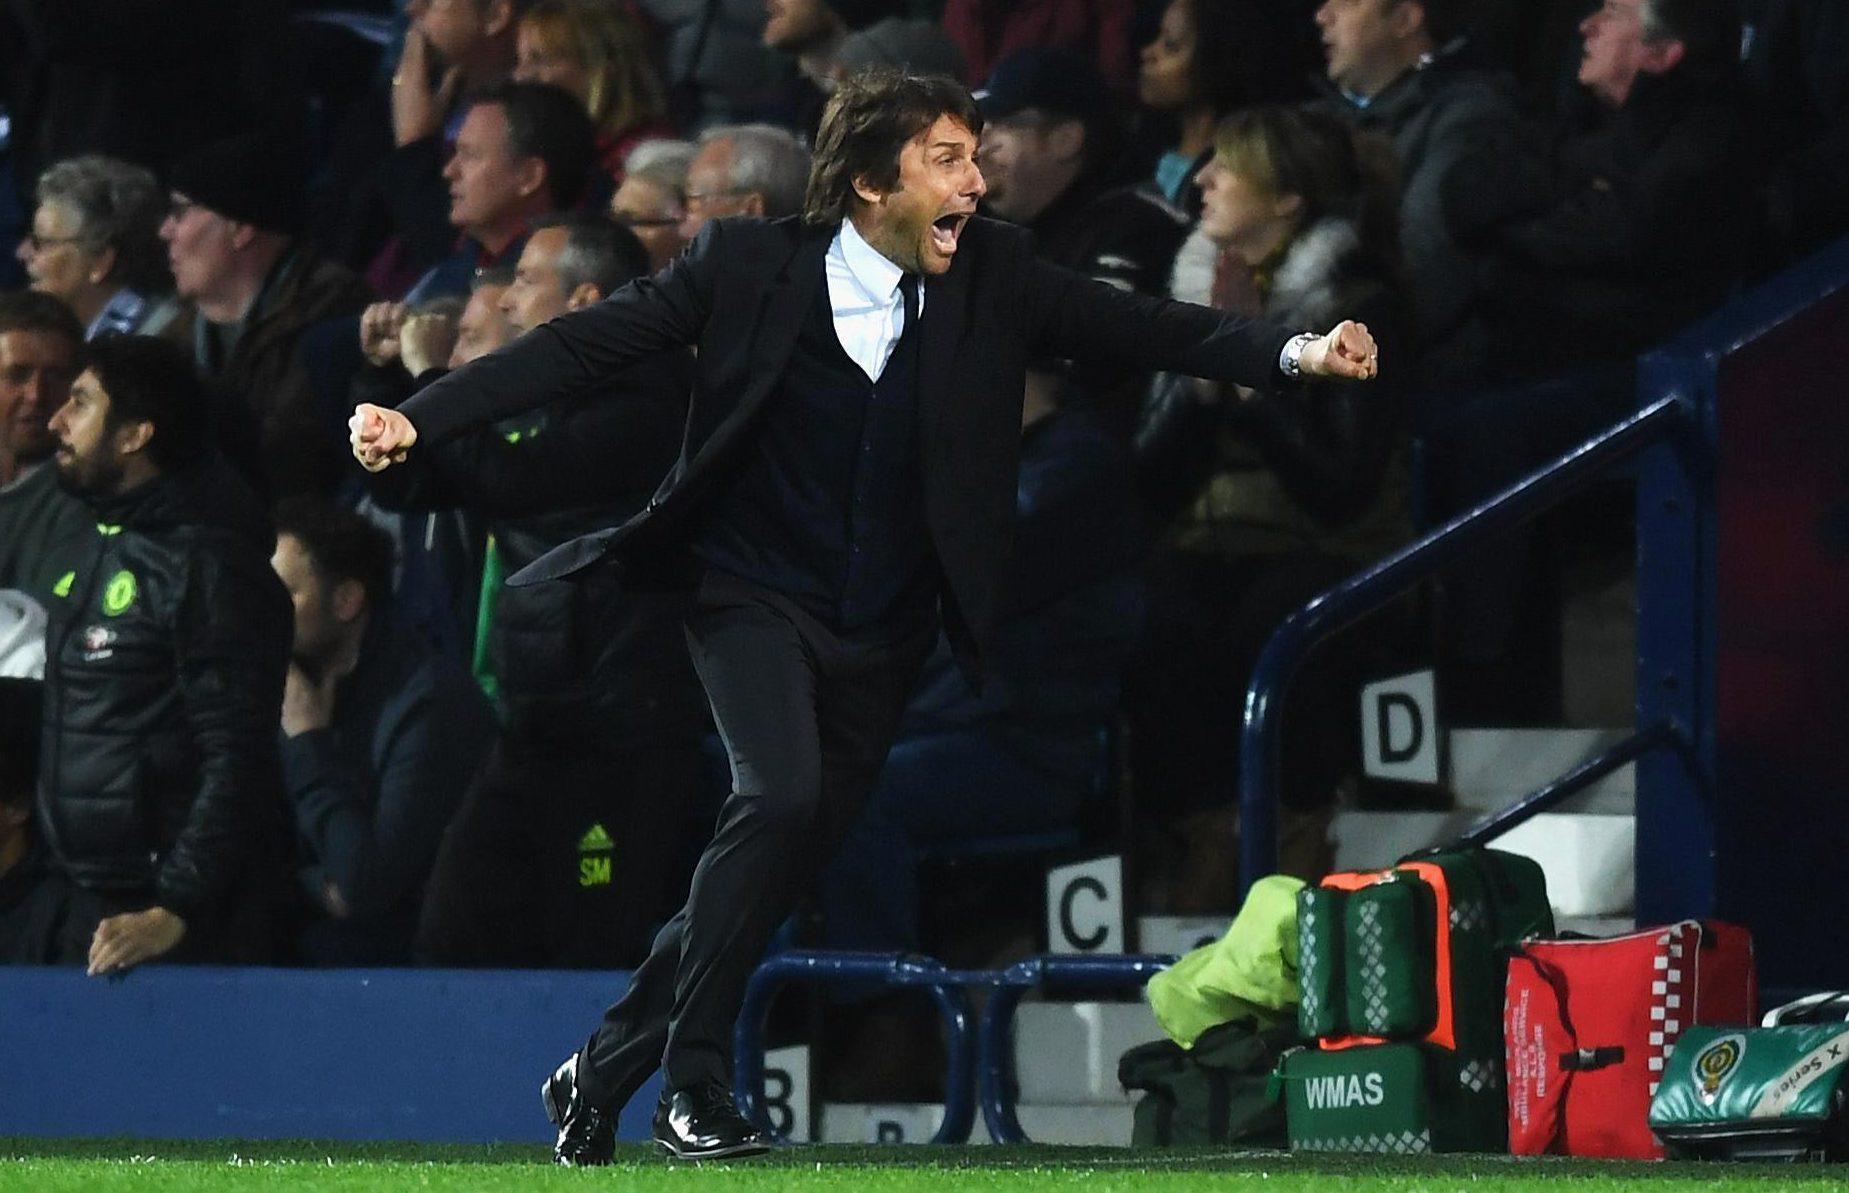 Chelsea manager Antonio Conte celebrates Michy Batshuayi scoring a late winner